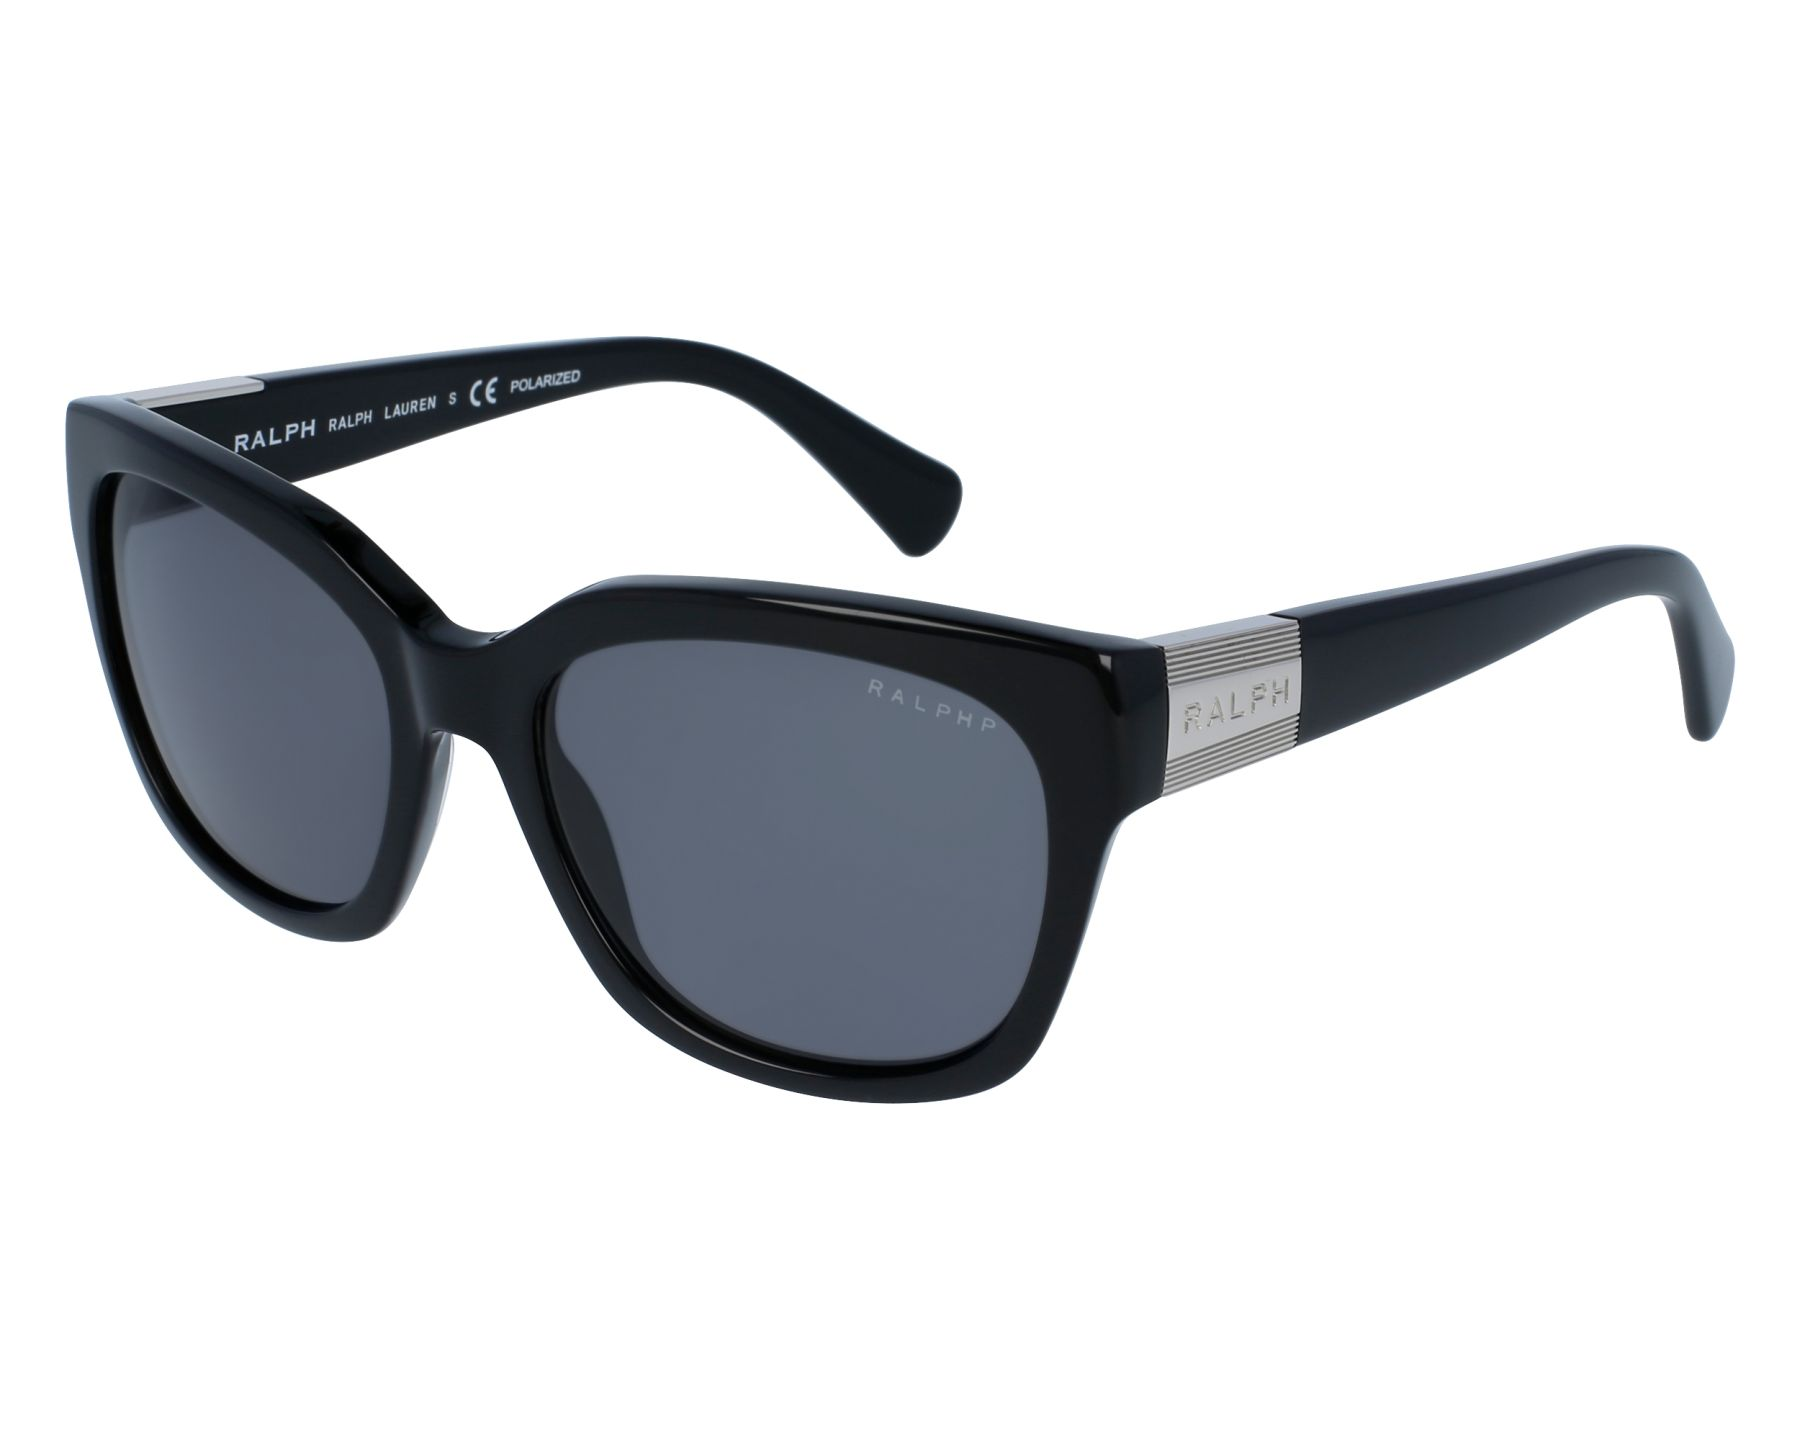 Ralph RA5221 Sonnenbrille Schwarz 137781 Polarisiert 54mm H3bWEmAGt